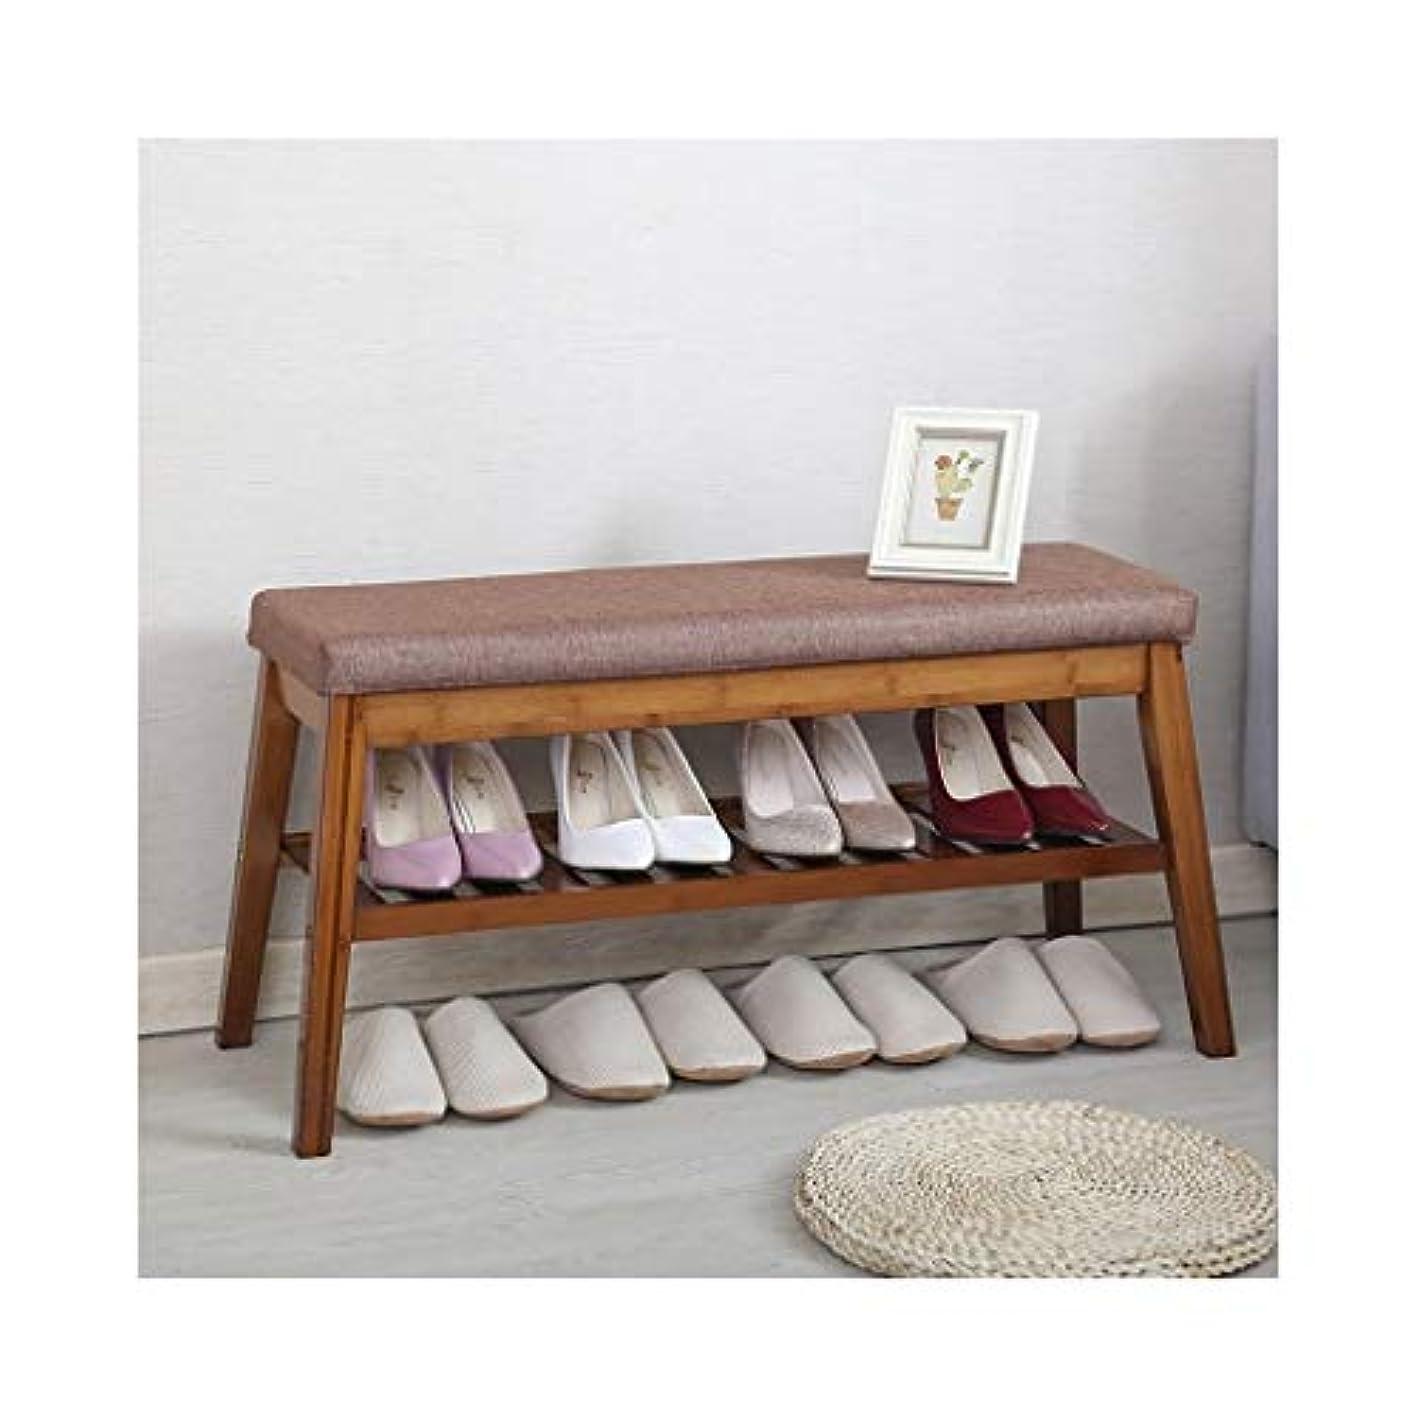 XDZW Bamboo Shoe Rack with Seat Cushion Box Organizer Shoe Storage Storage Box 2 Layers 92 36 45cm